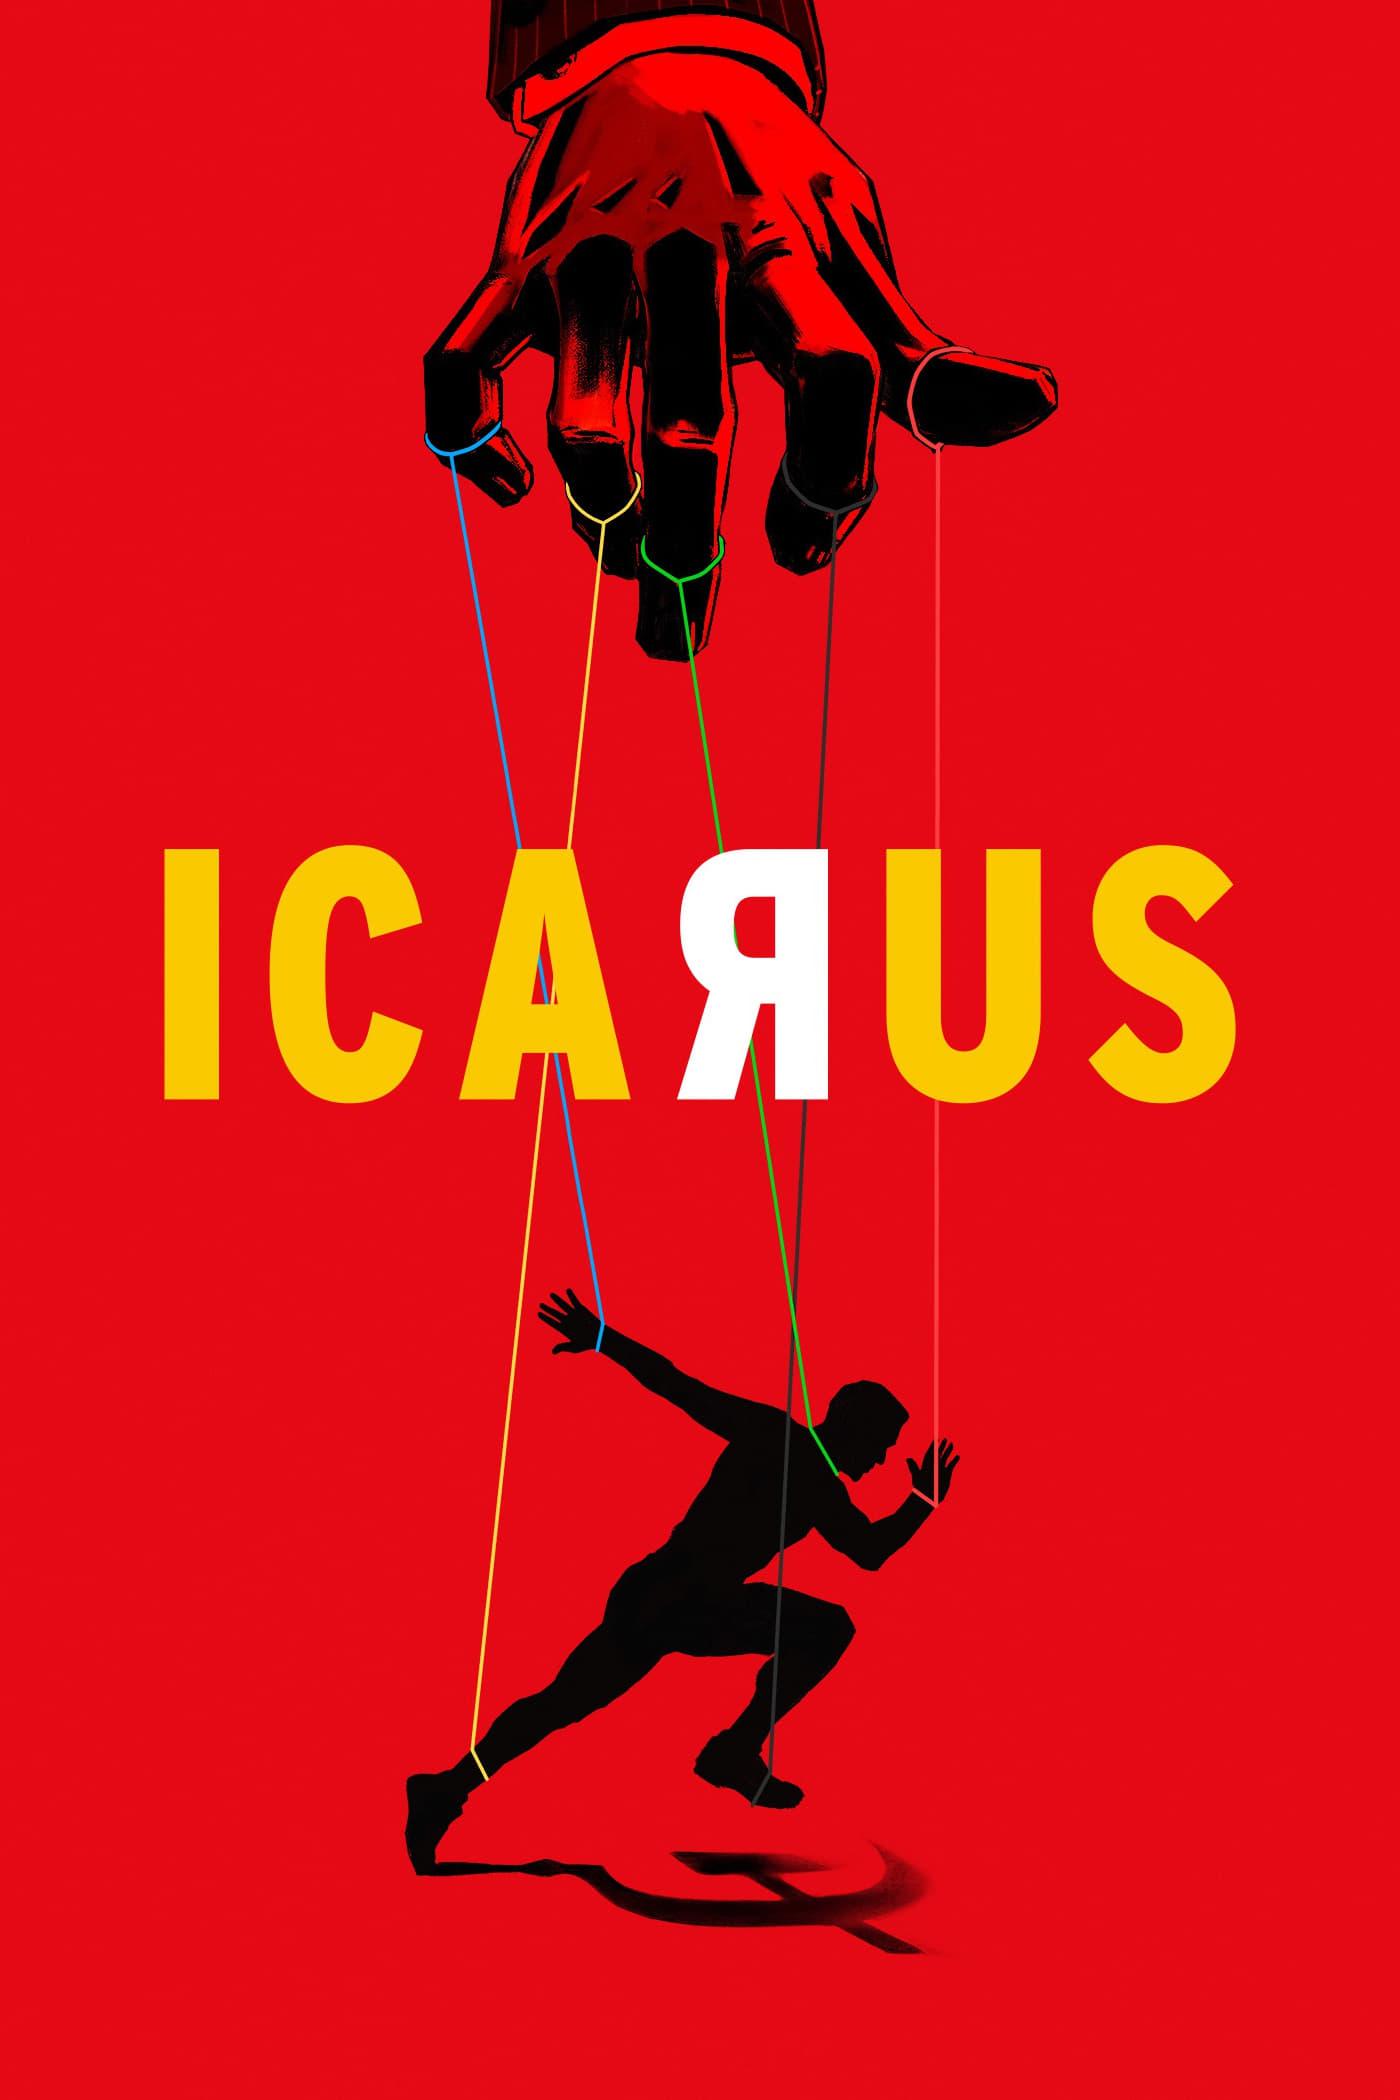 Assistir Icarus Legendado Online Legendado 1080p